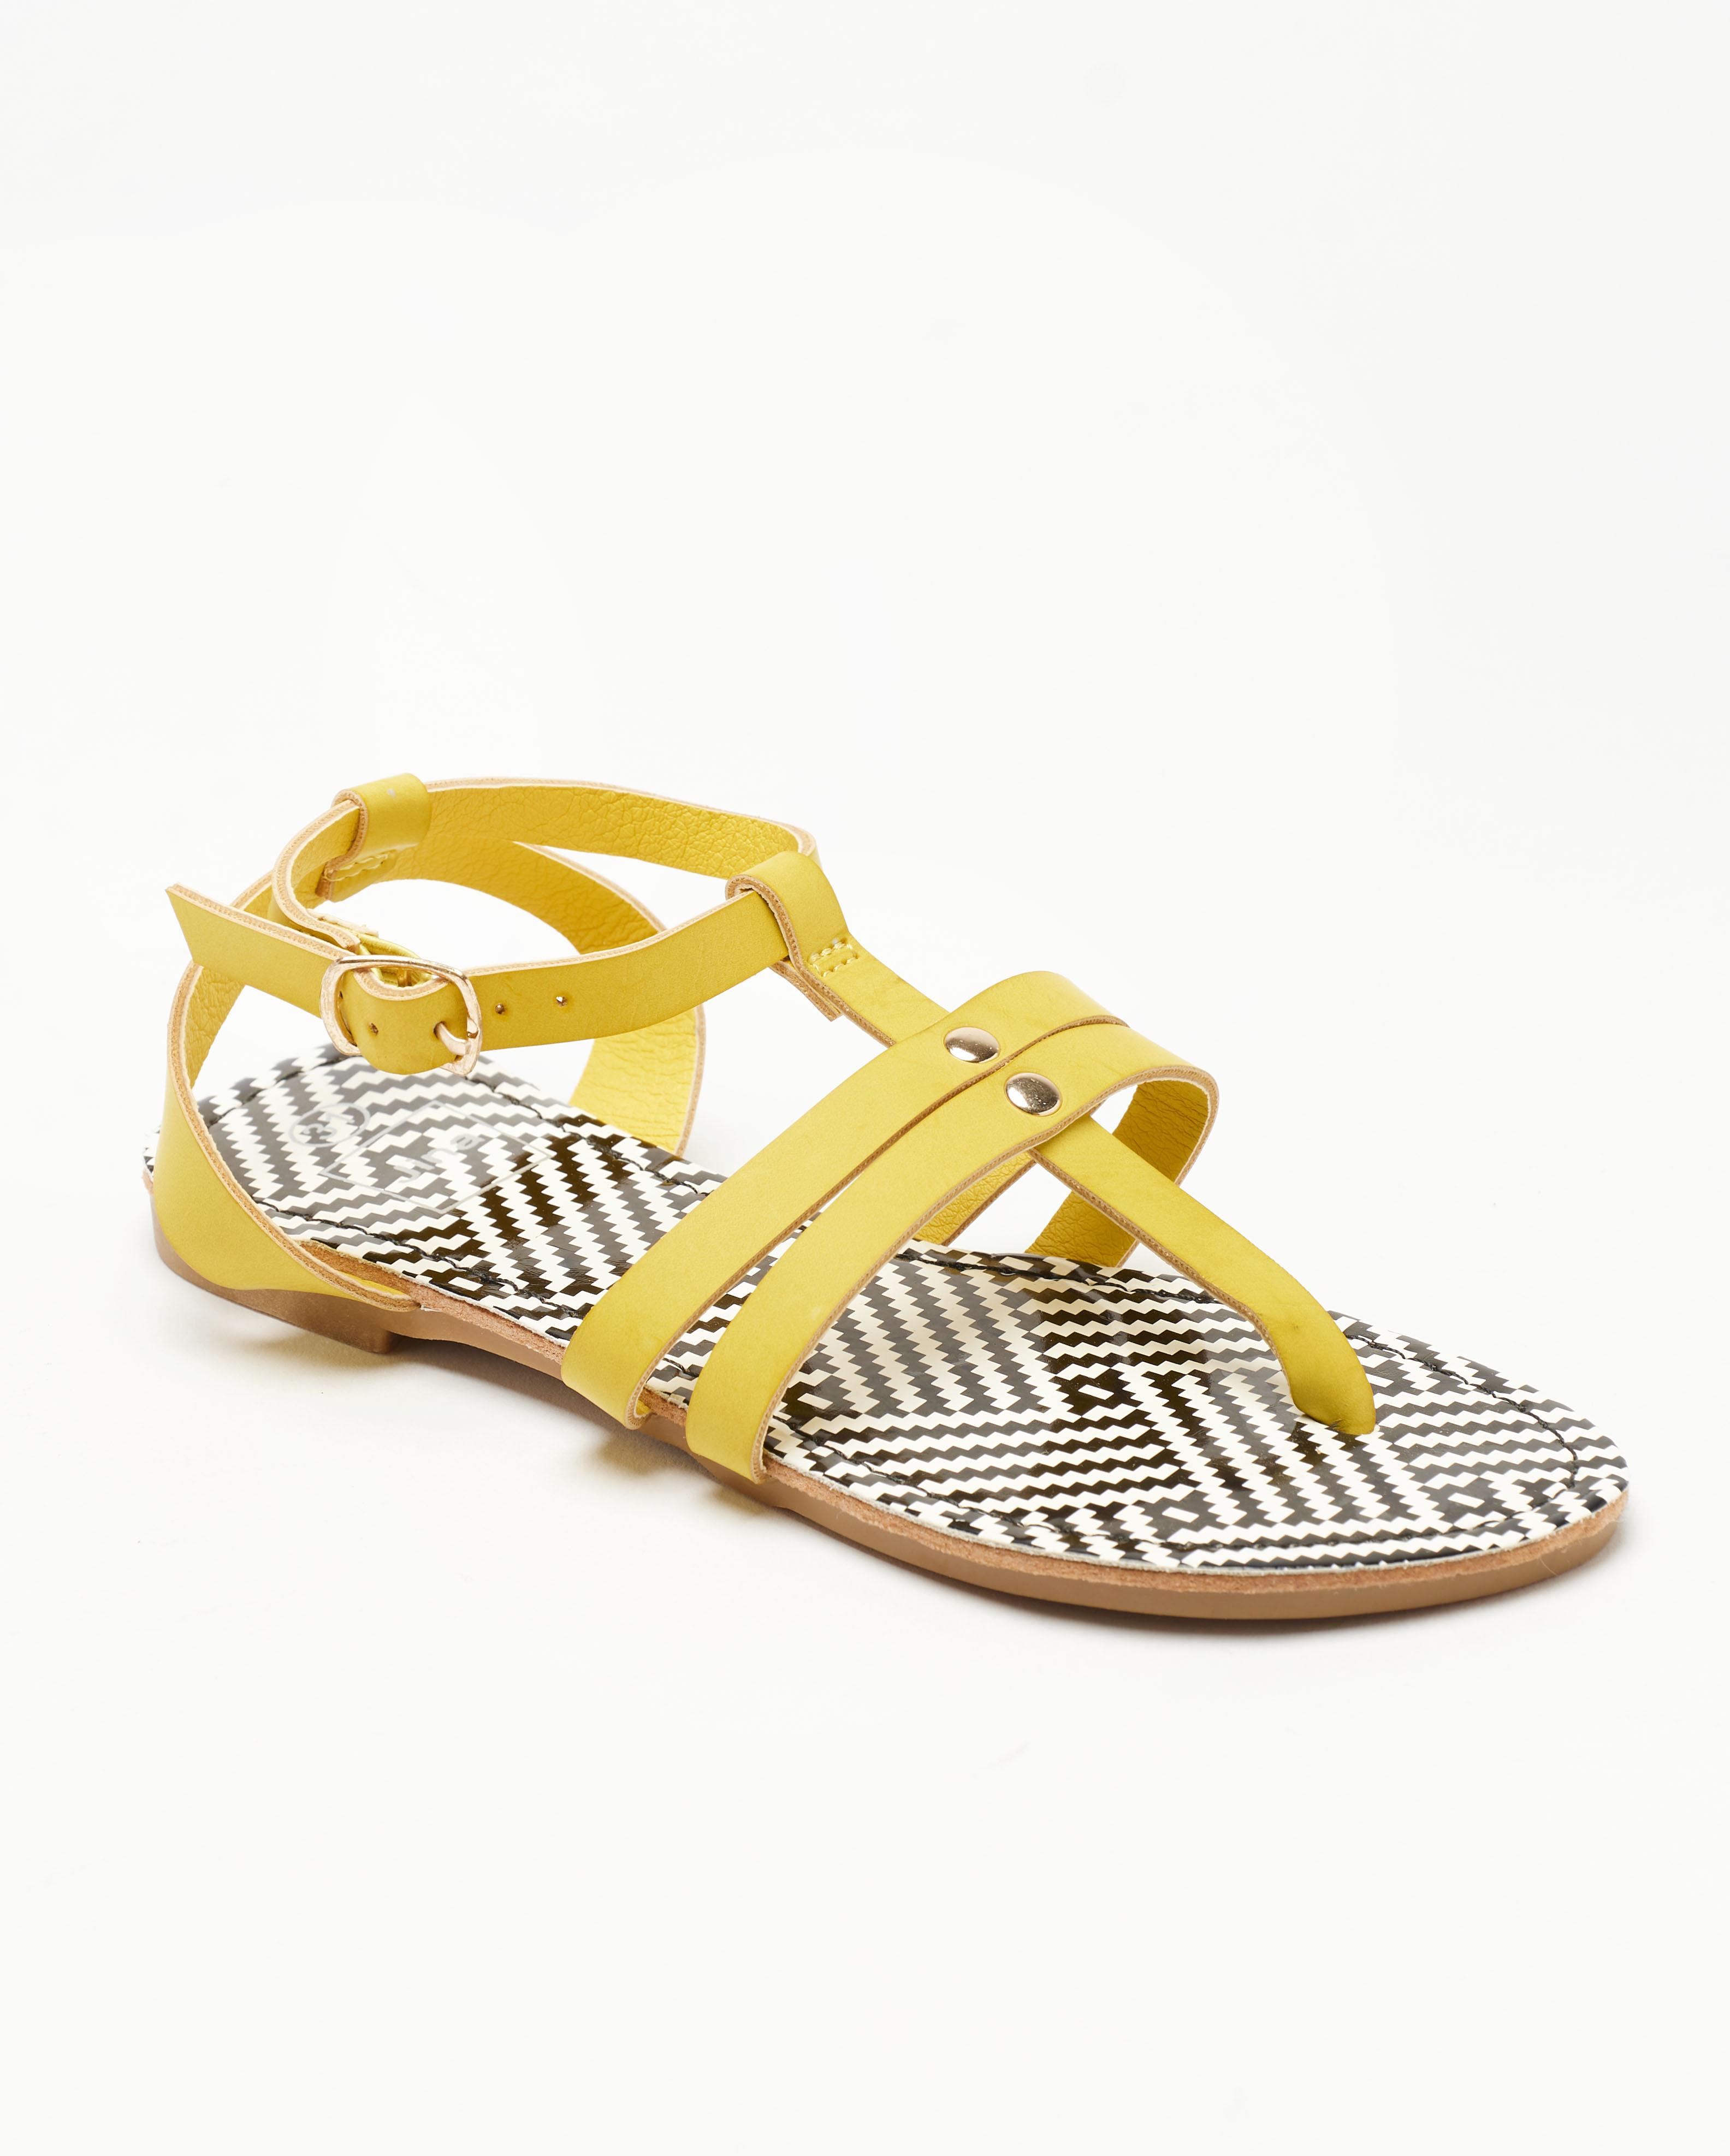 Sandales Plates Femme - Sandale Plate Jaune Jina - Sapl Zh4